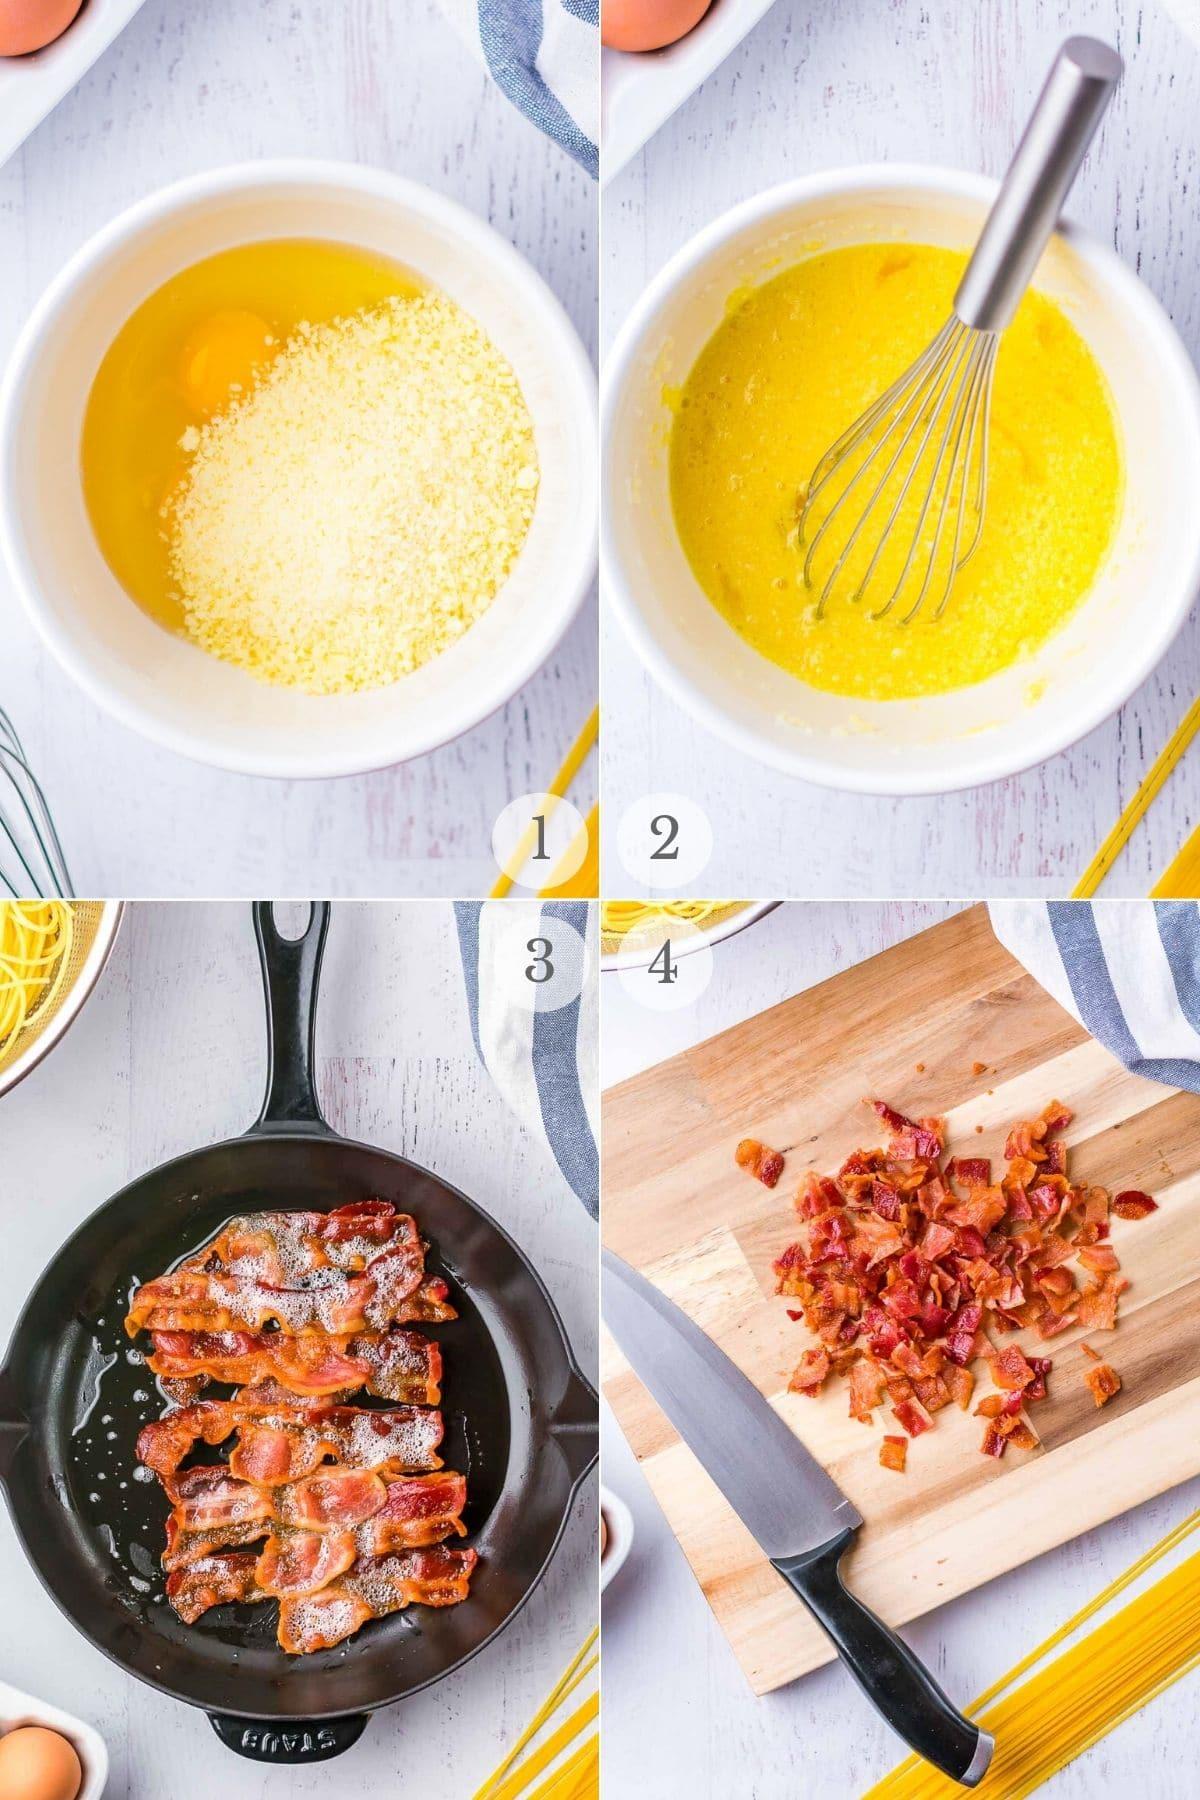 spaghetti carbonara recipe steps 1-4